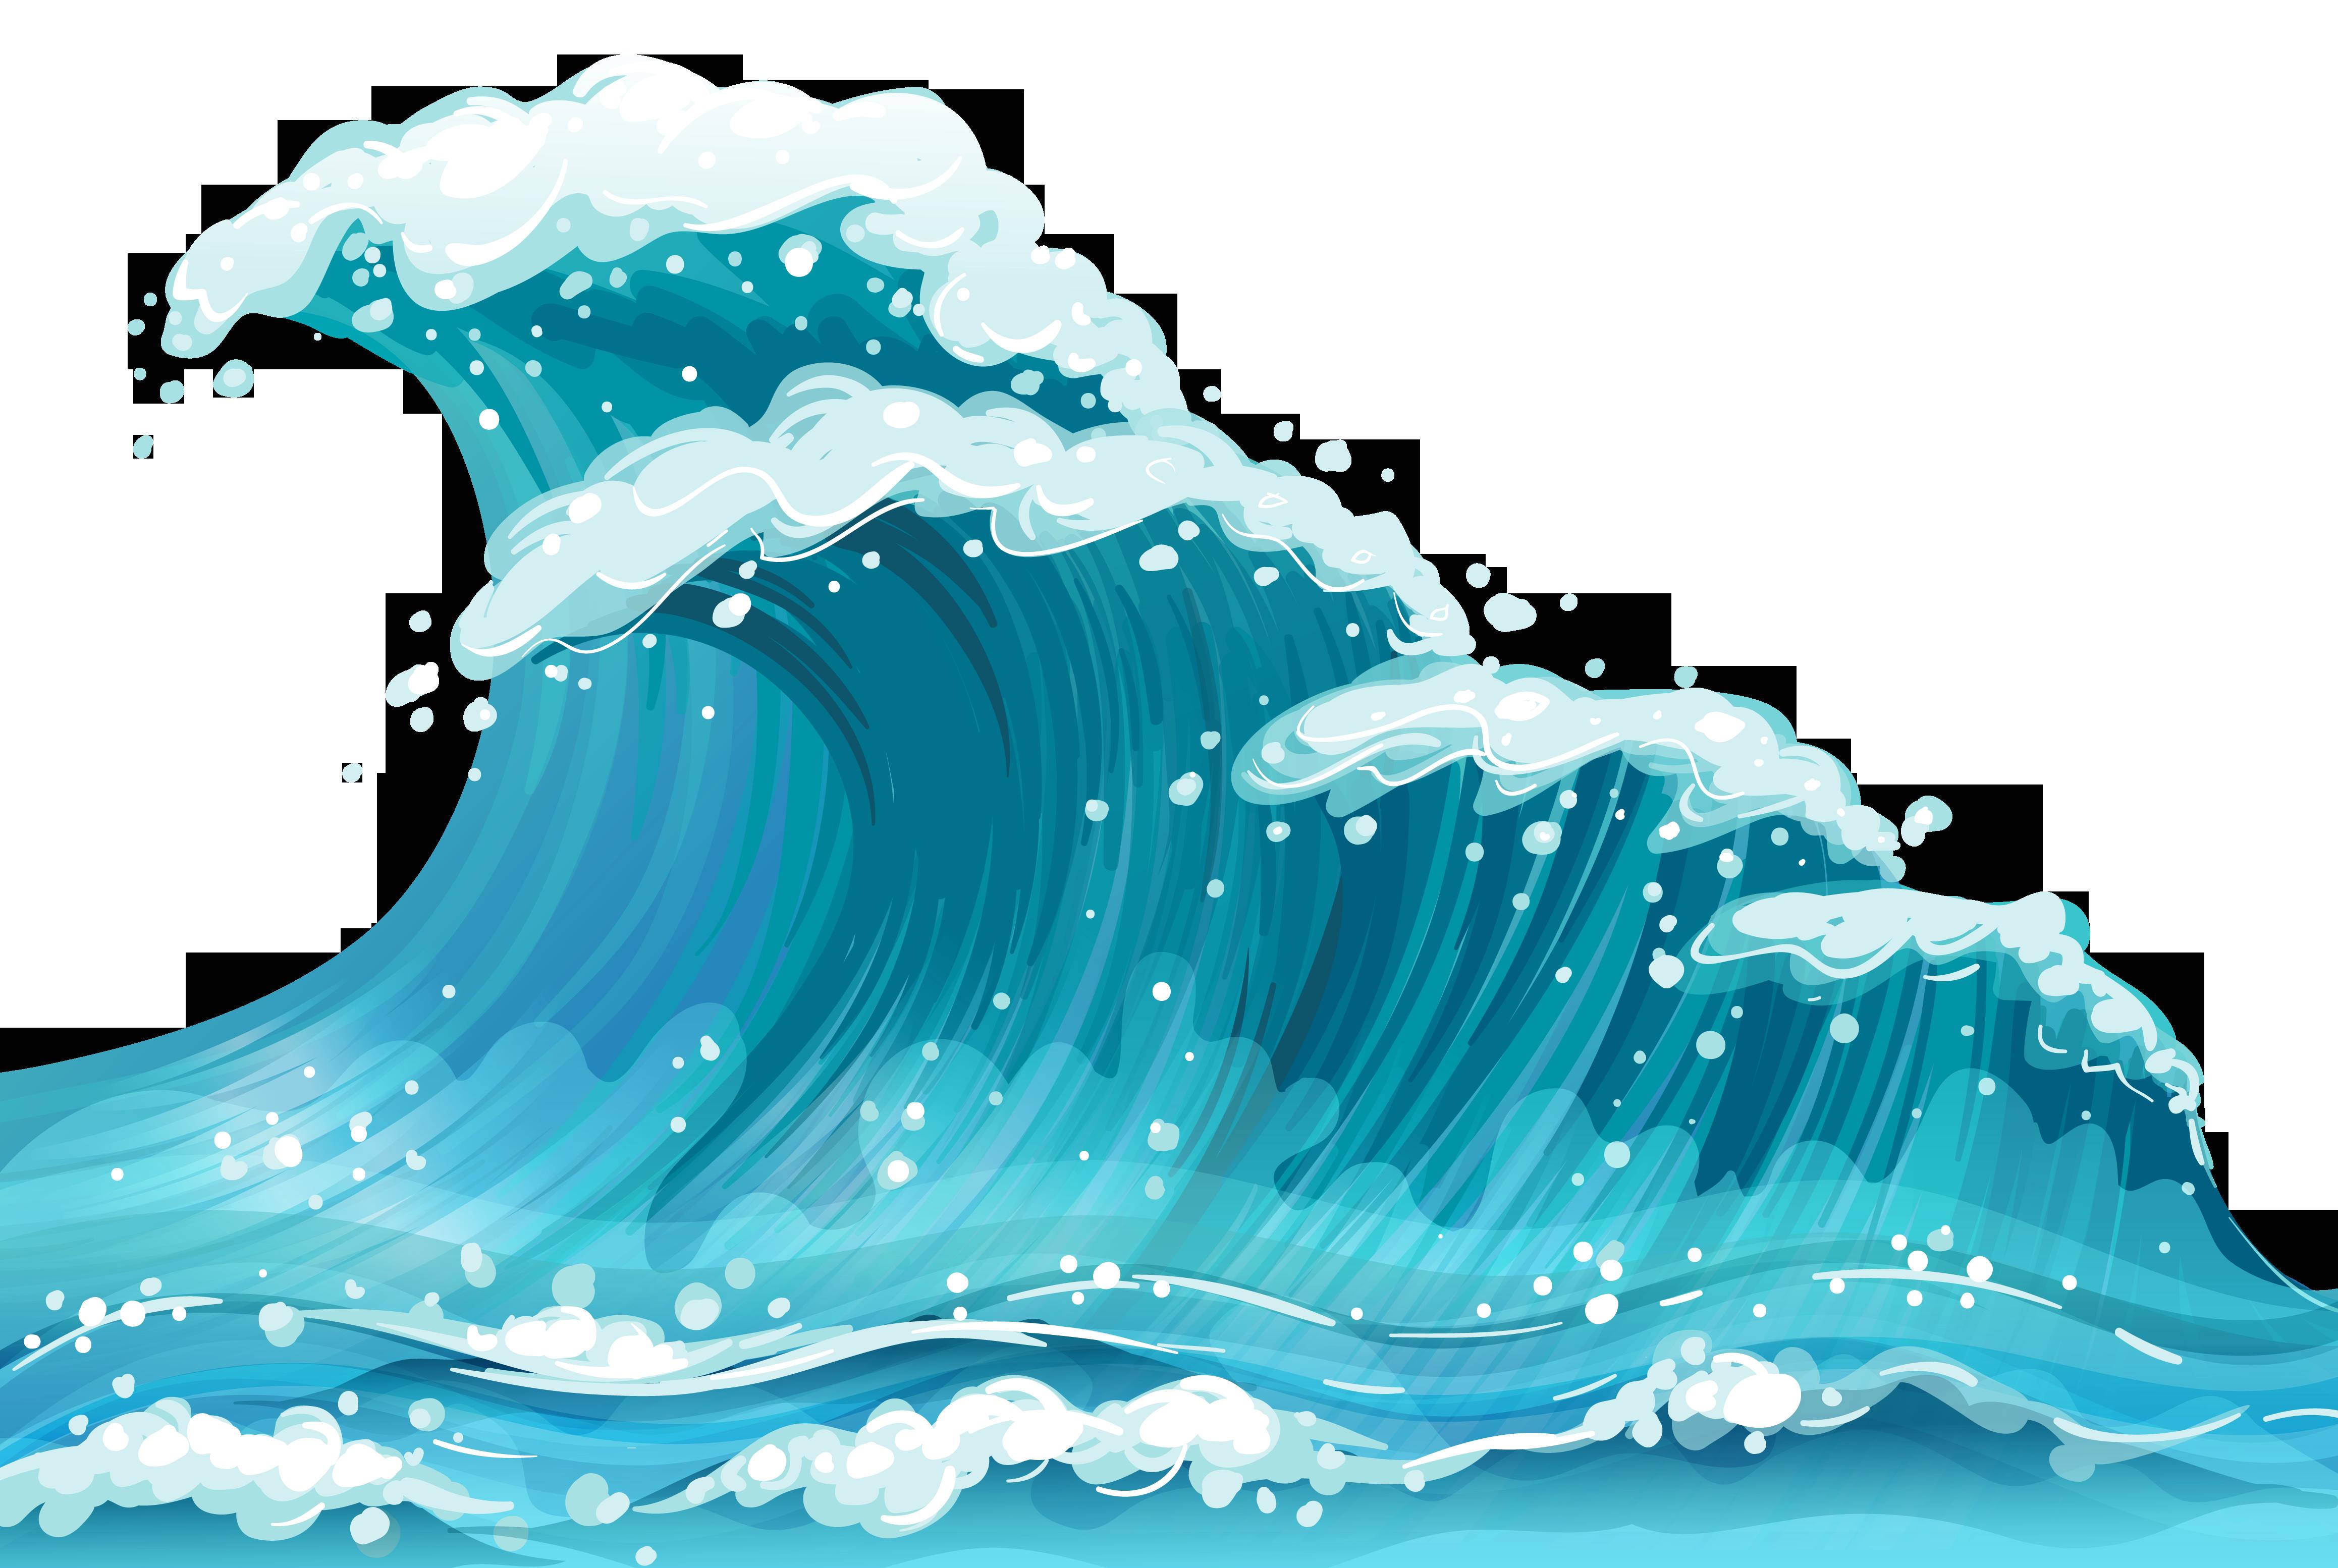 Clipart waves tumundografico-Clipart waves tumundografico-6